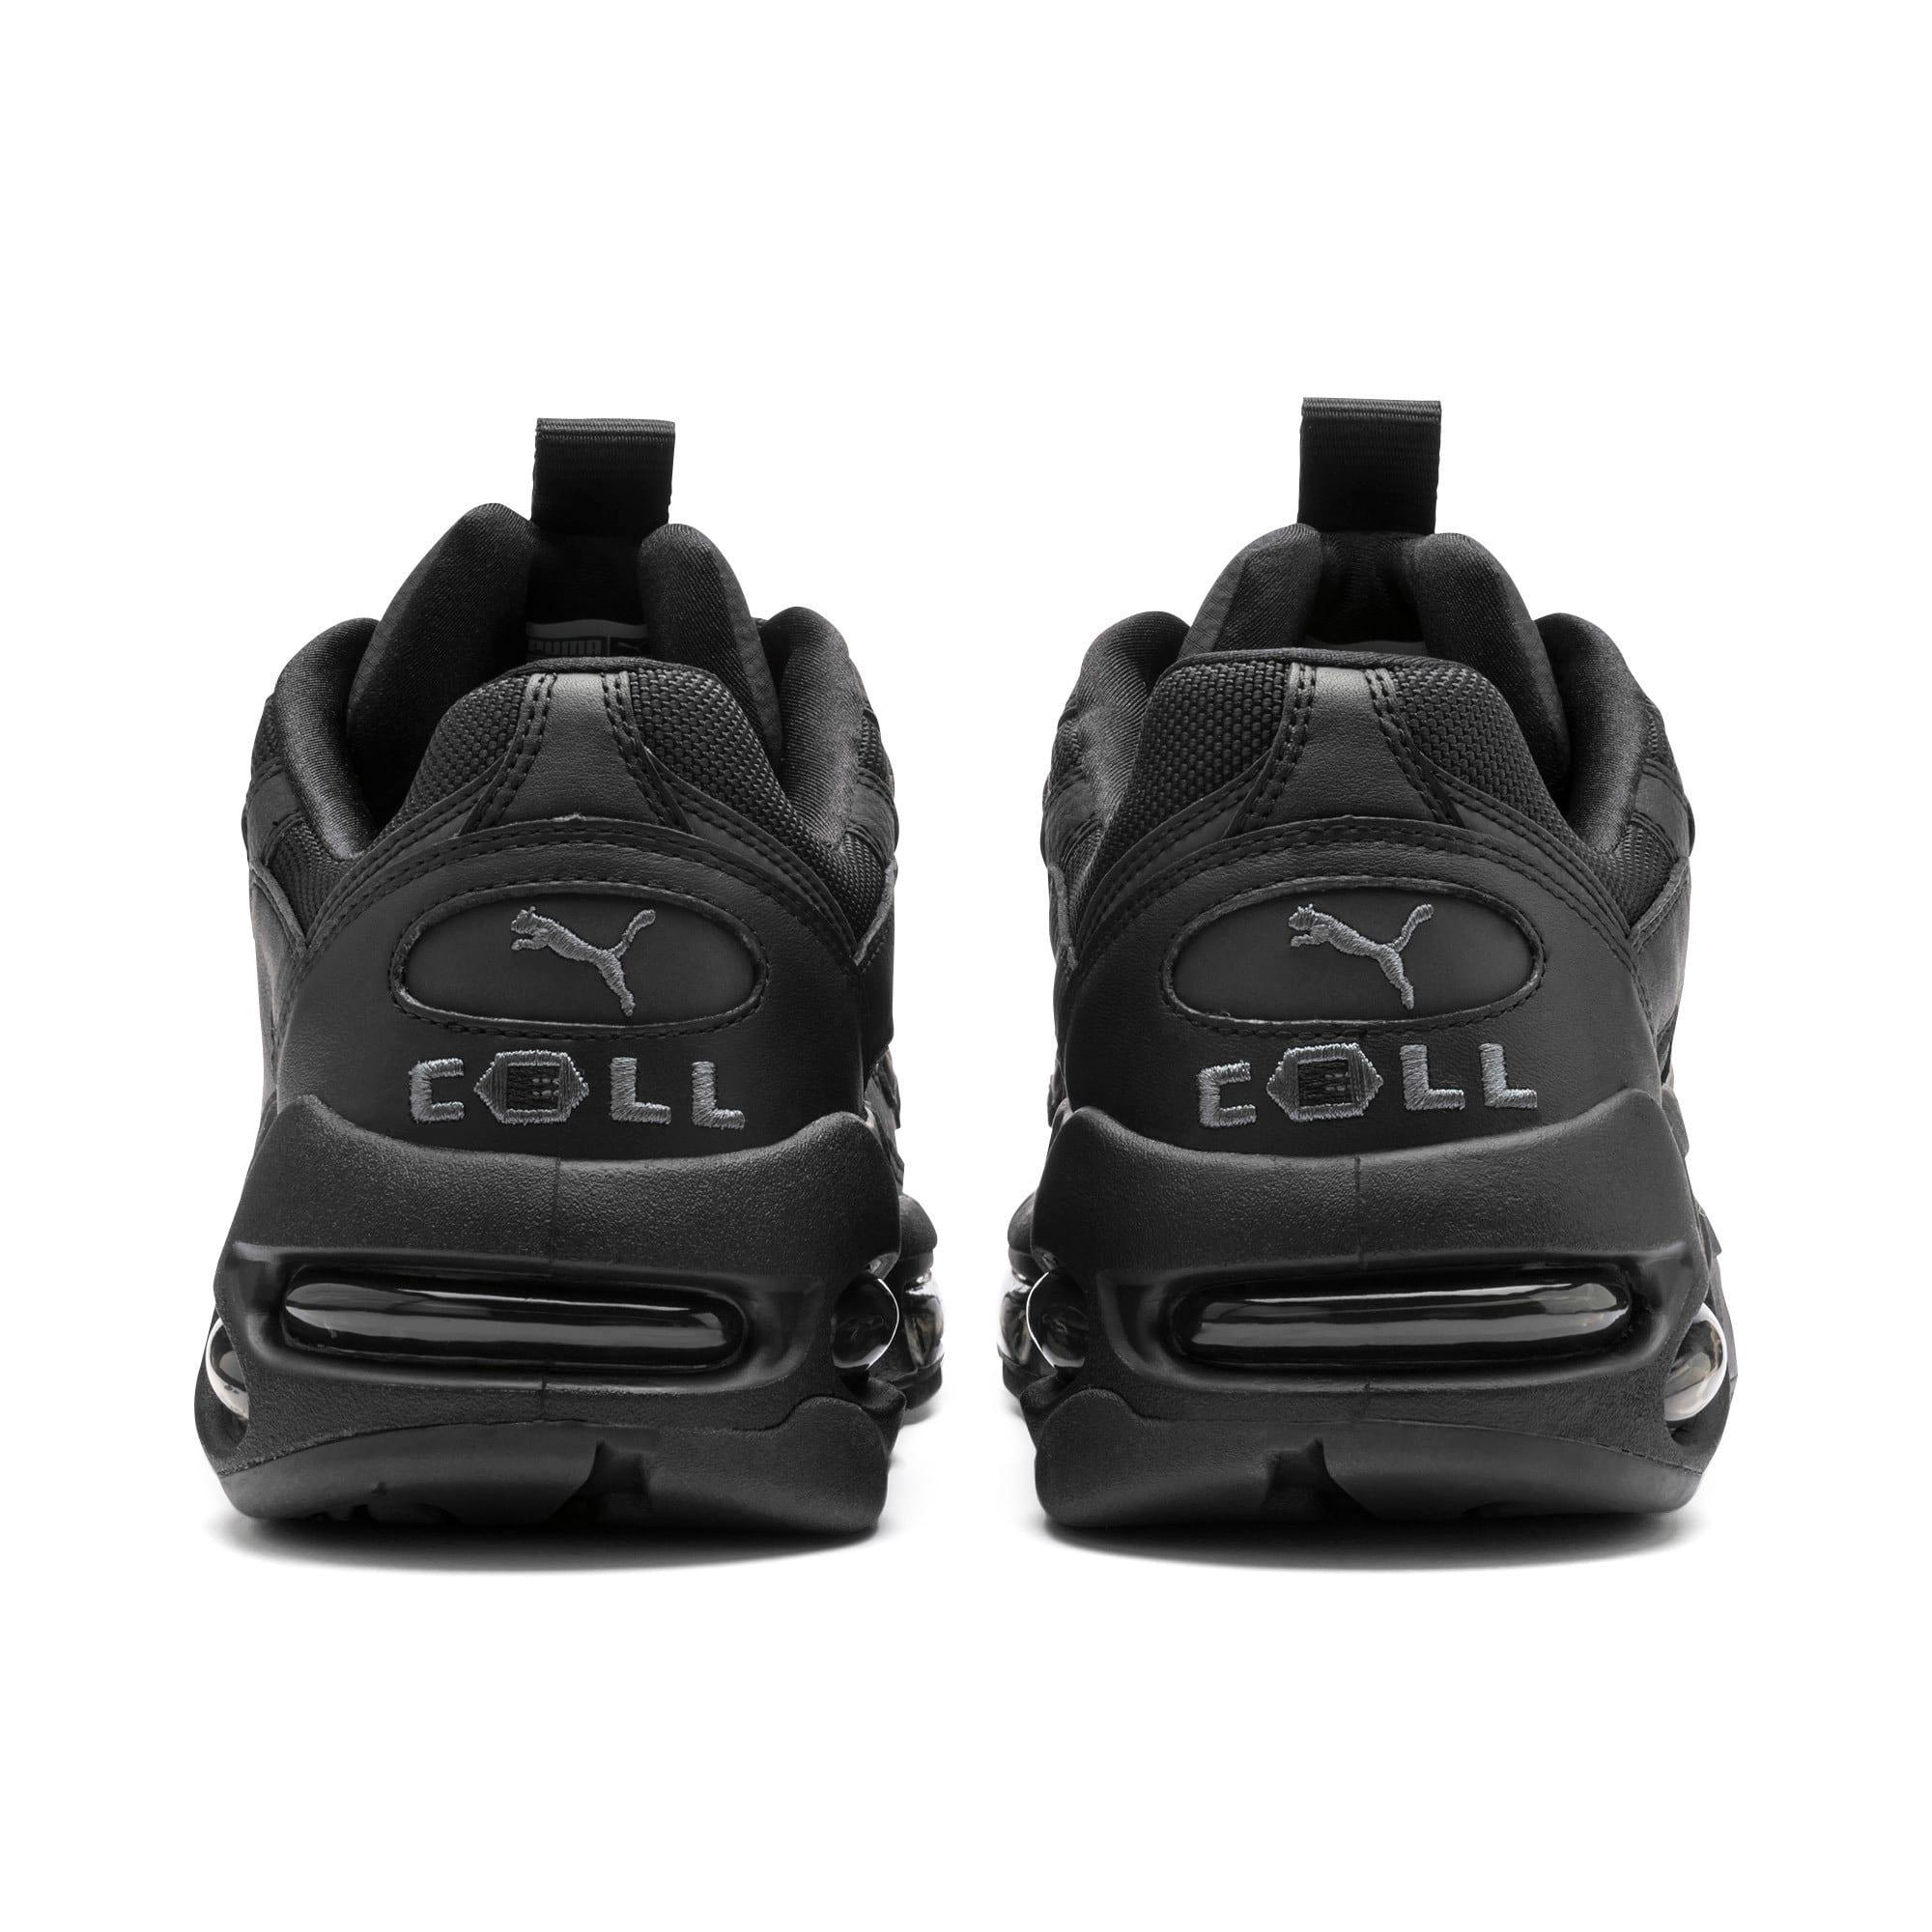 Thumbnail 4 of CELL Endura Rebound Sneakers, Puma Black-Puma Black, medium